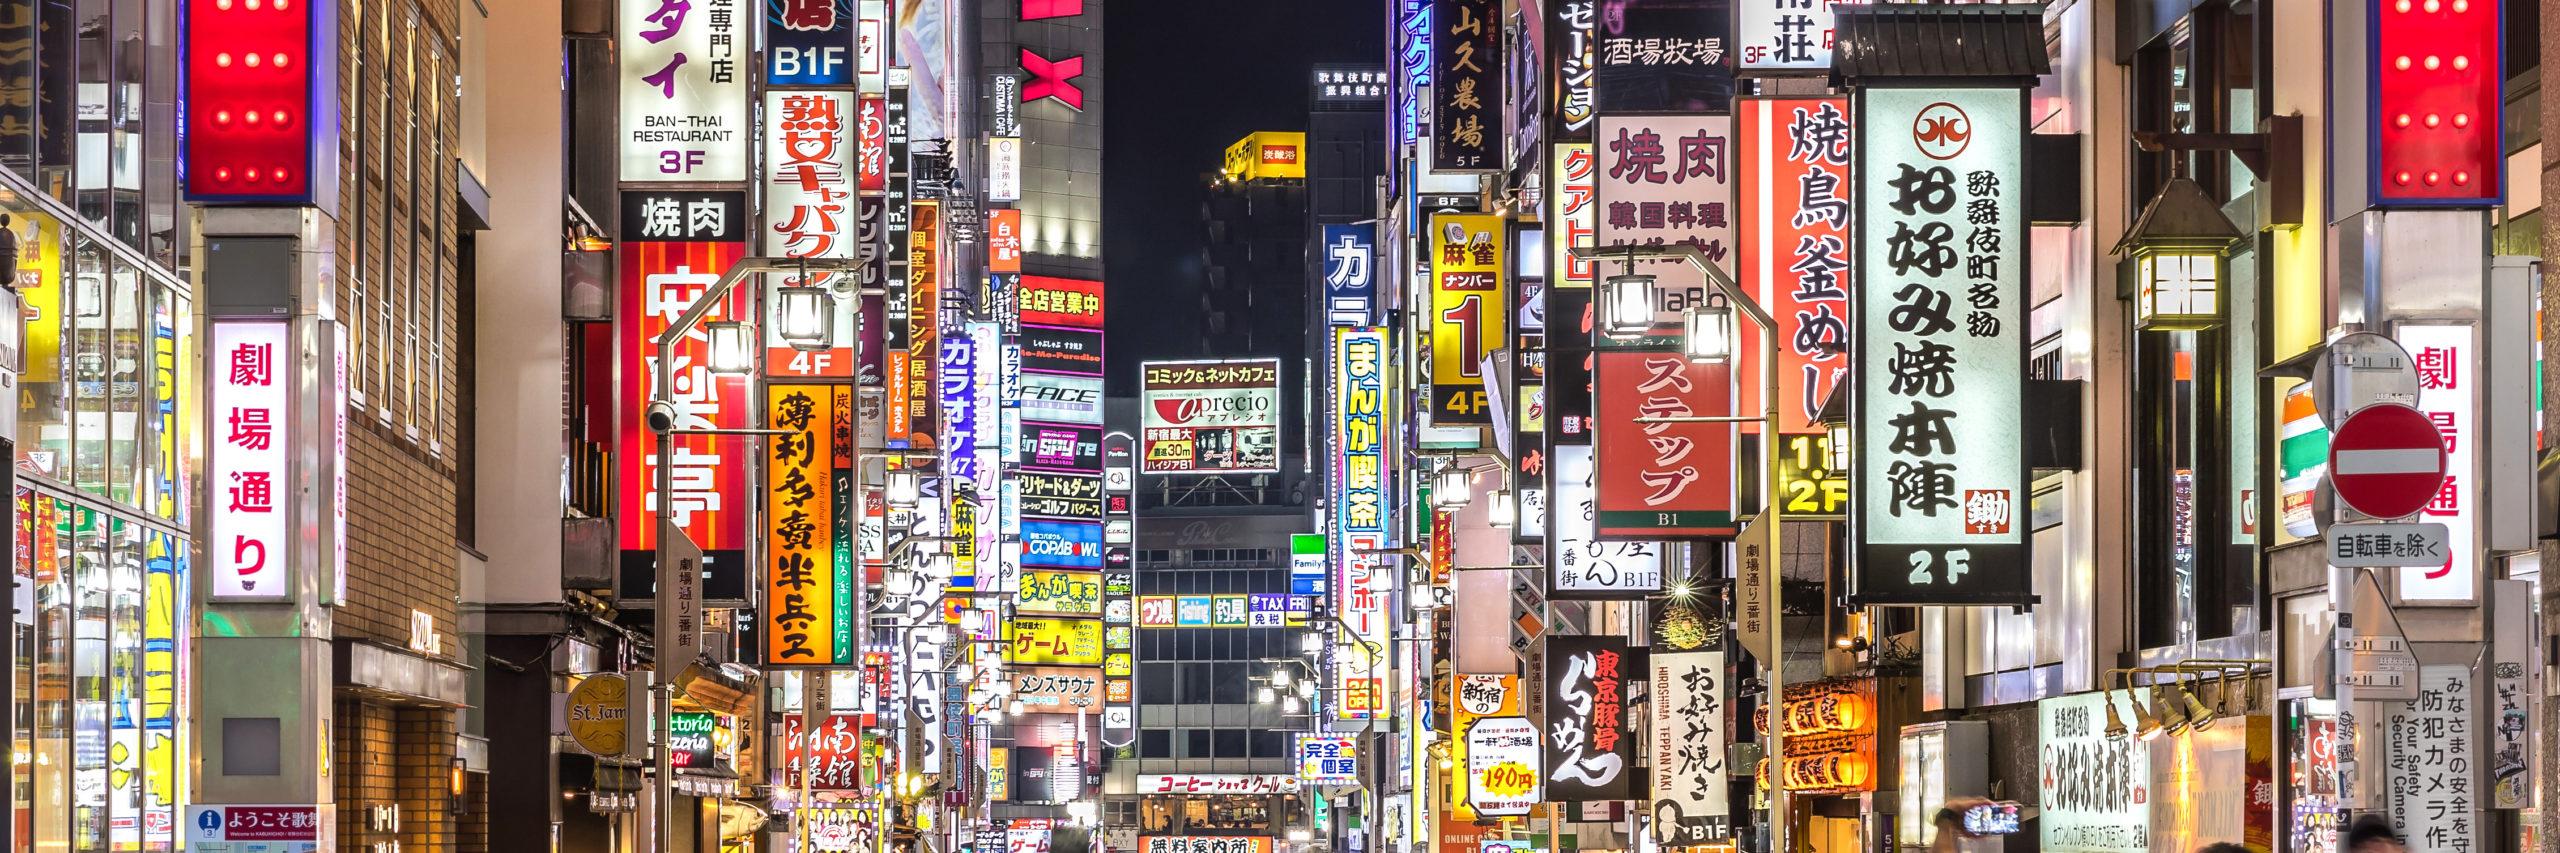 Vieni con me a Tokyo sara caulfield